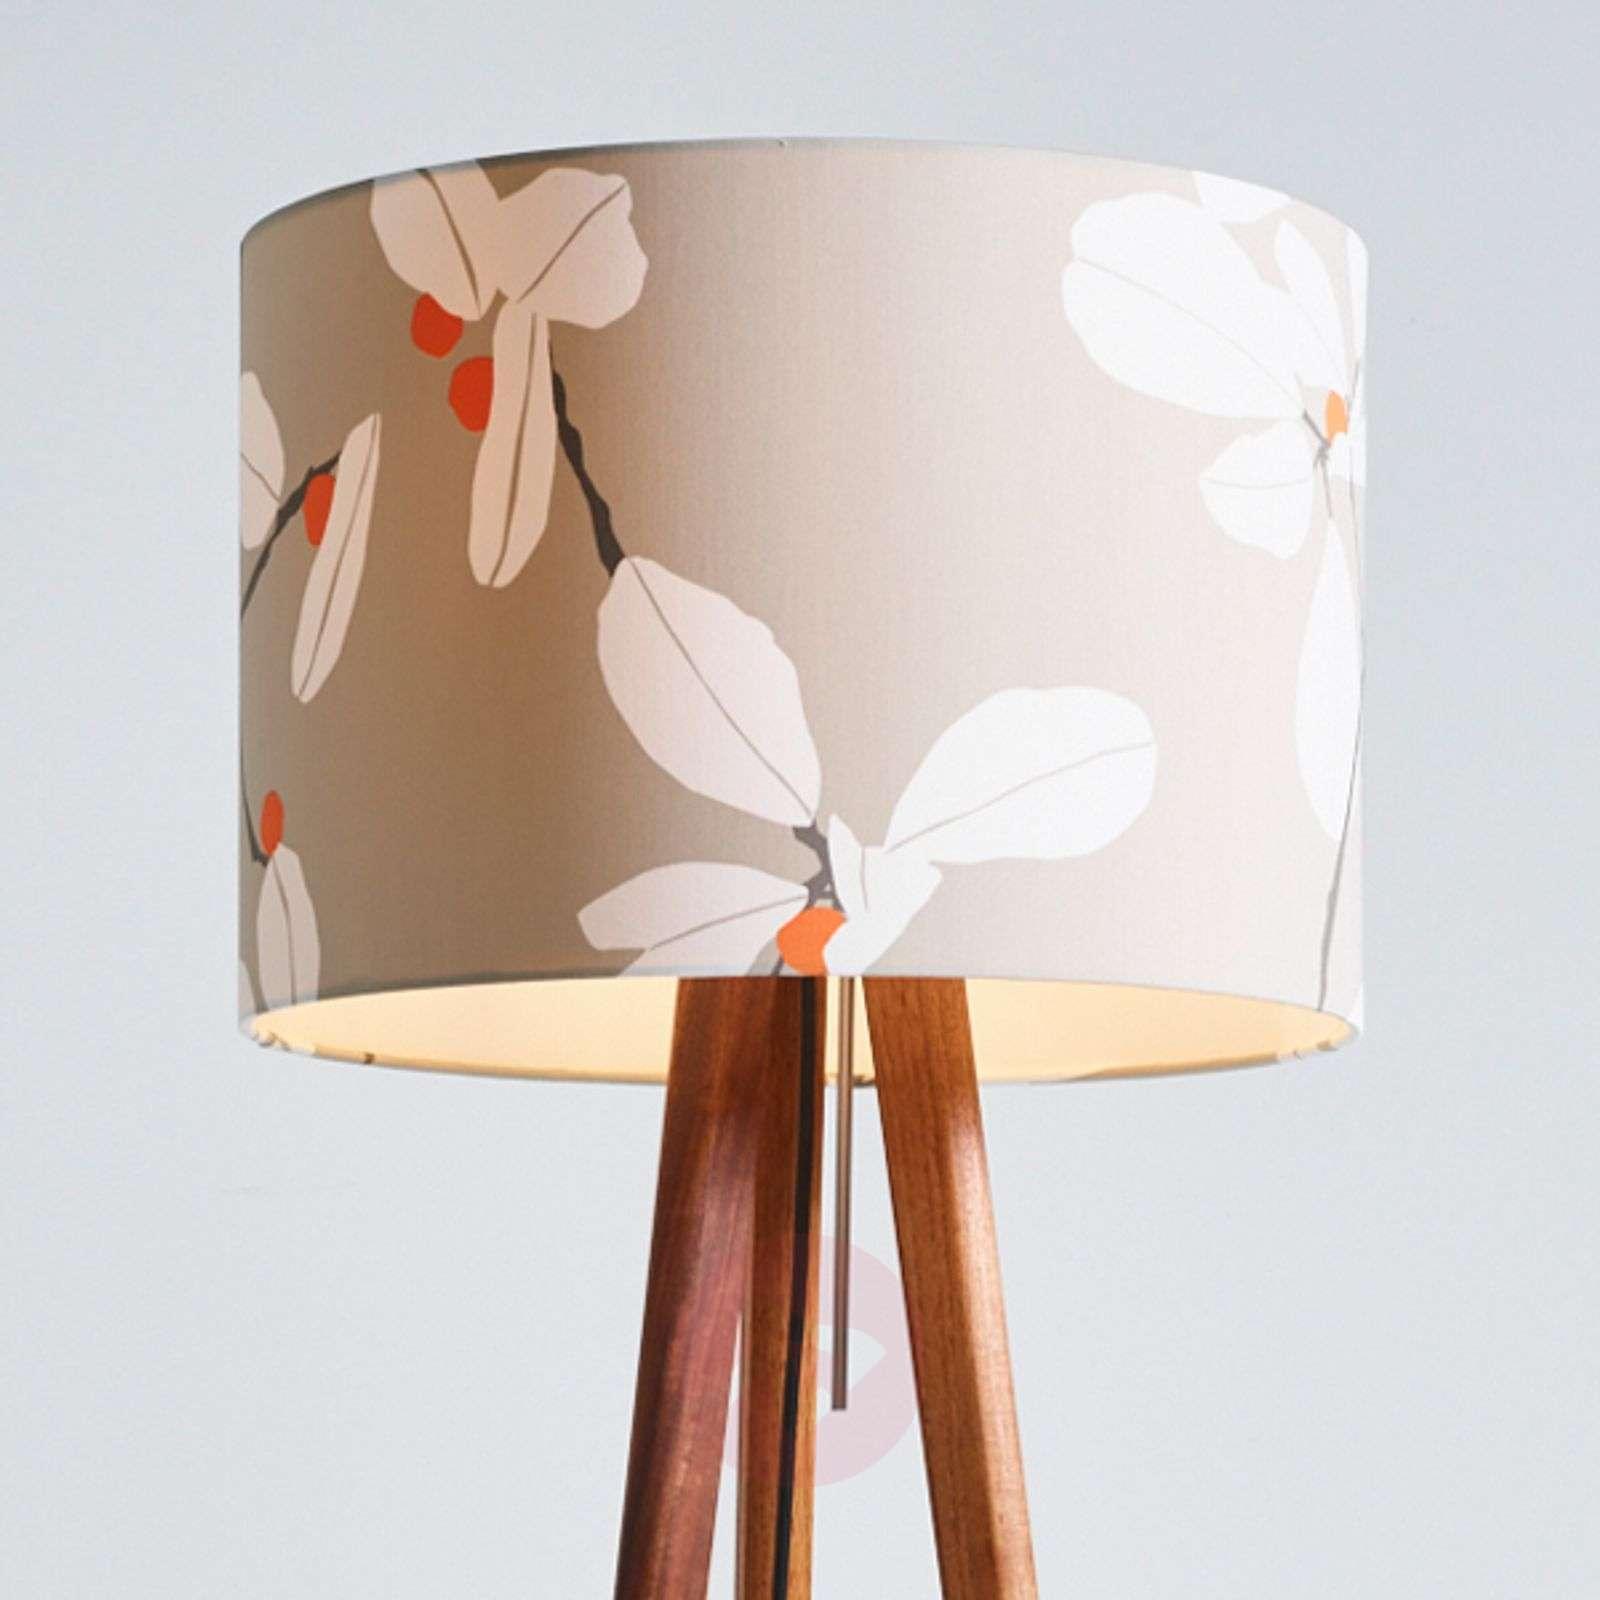 Floor lamp Sten Flower with a wooden tripod-2600527-01